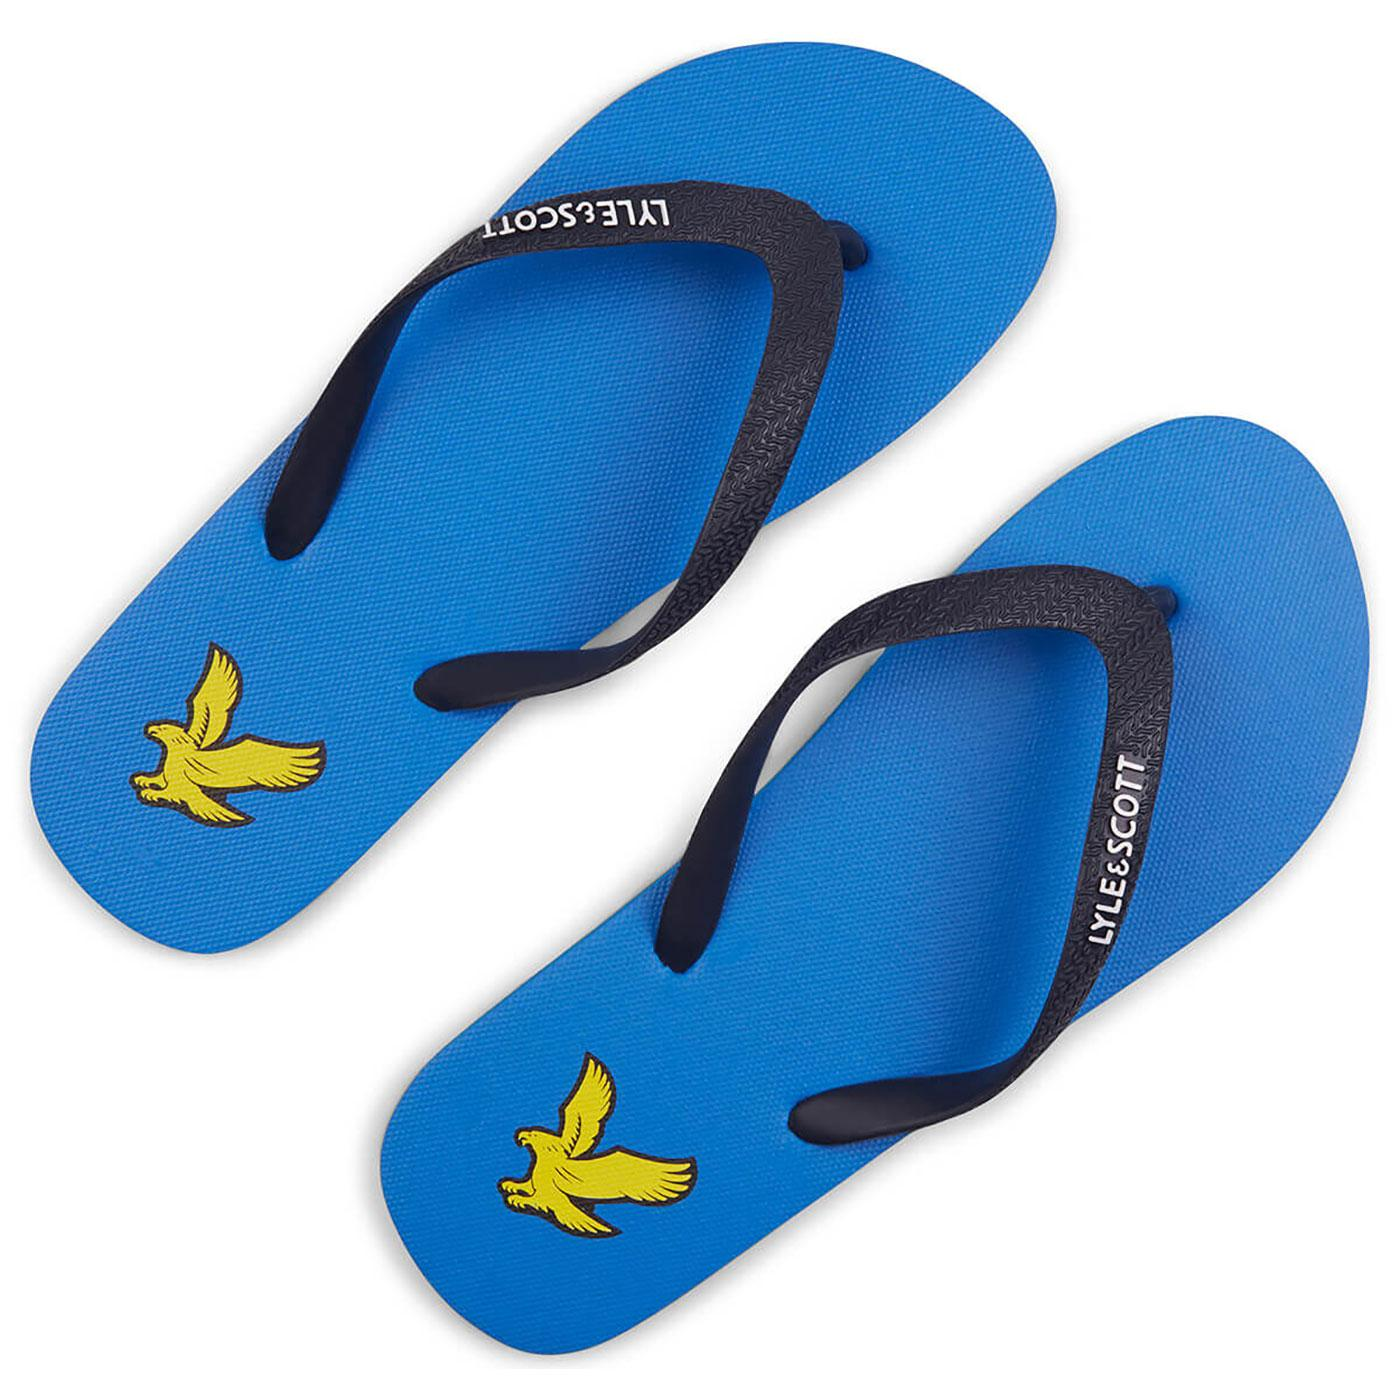 LYLE & SCOTT Mens Retro Logo Flipflip Sandals BLUE